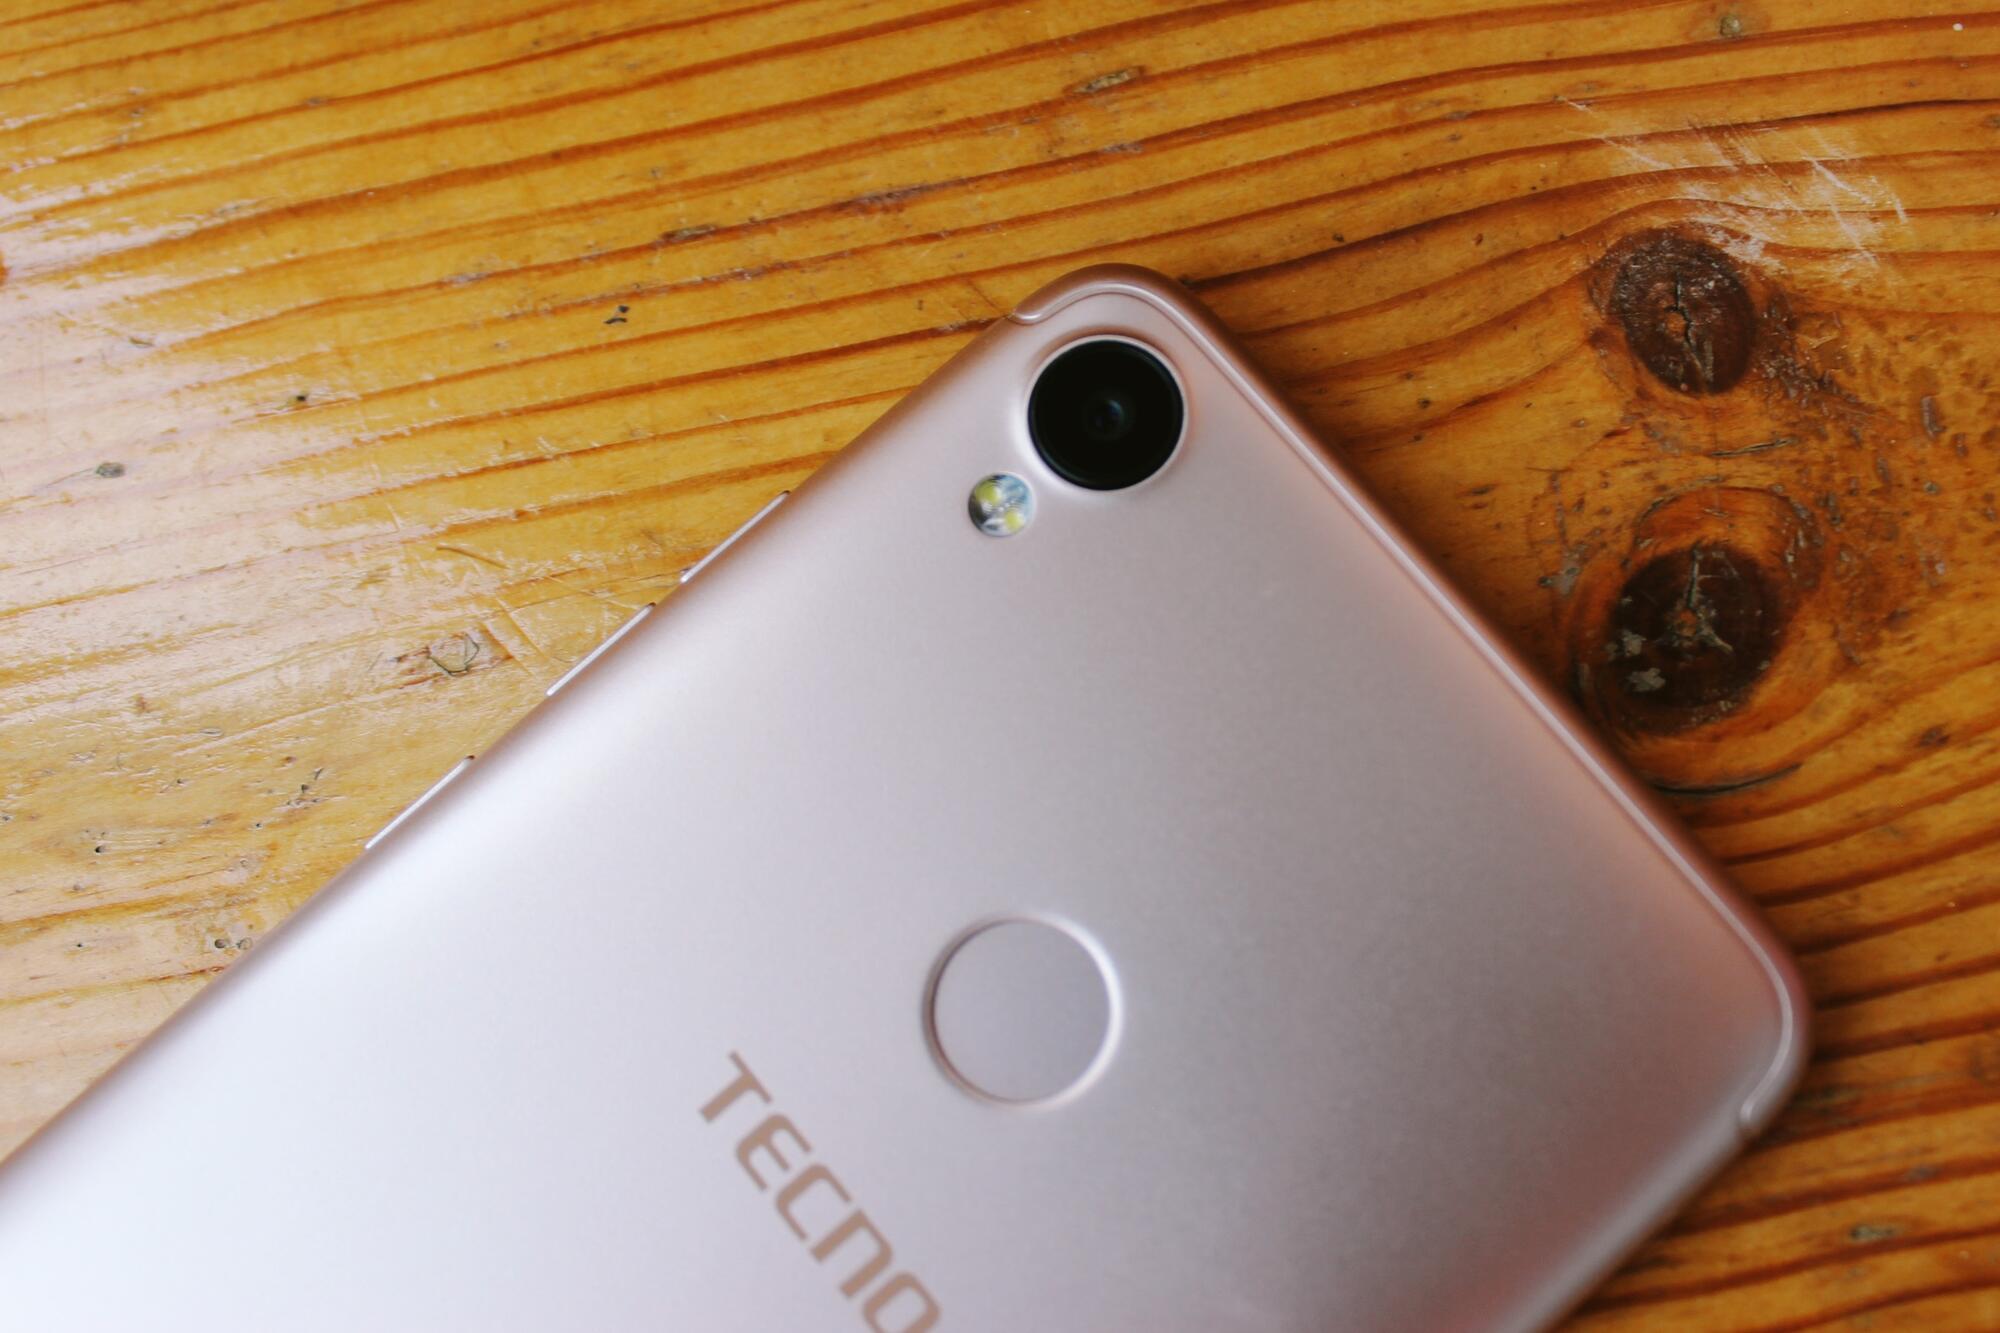 Smartfony i aksessuary - Yarkiy smartfon TECNO POP 1S Pro